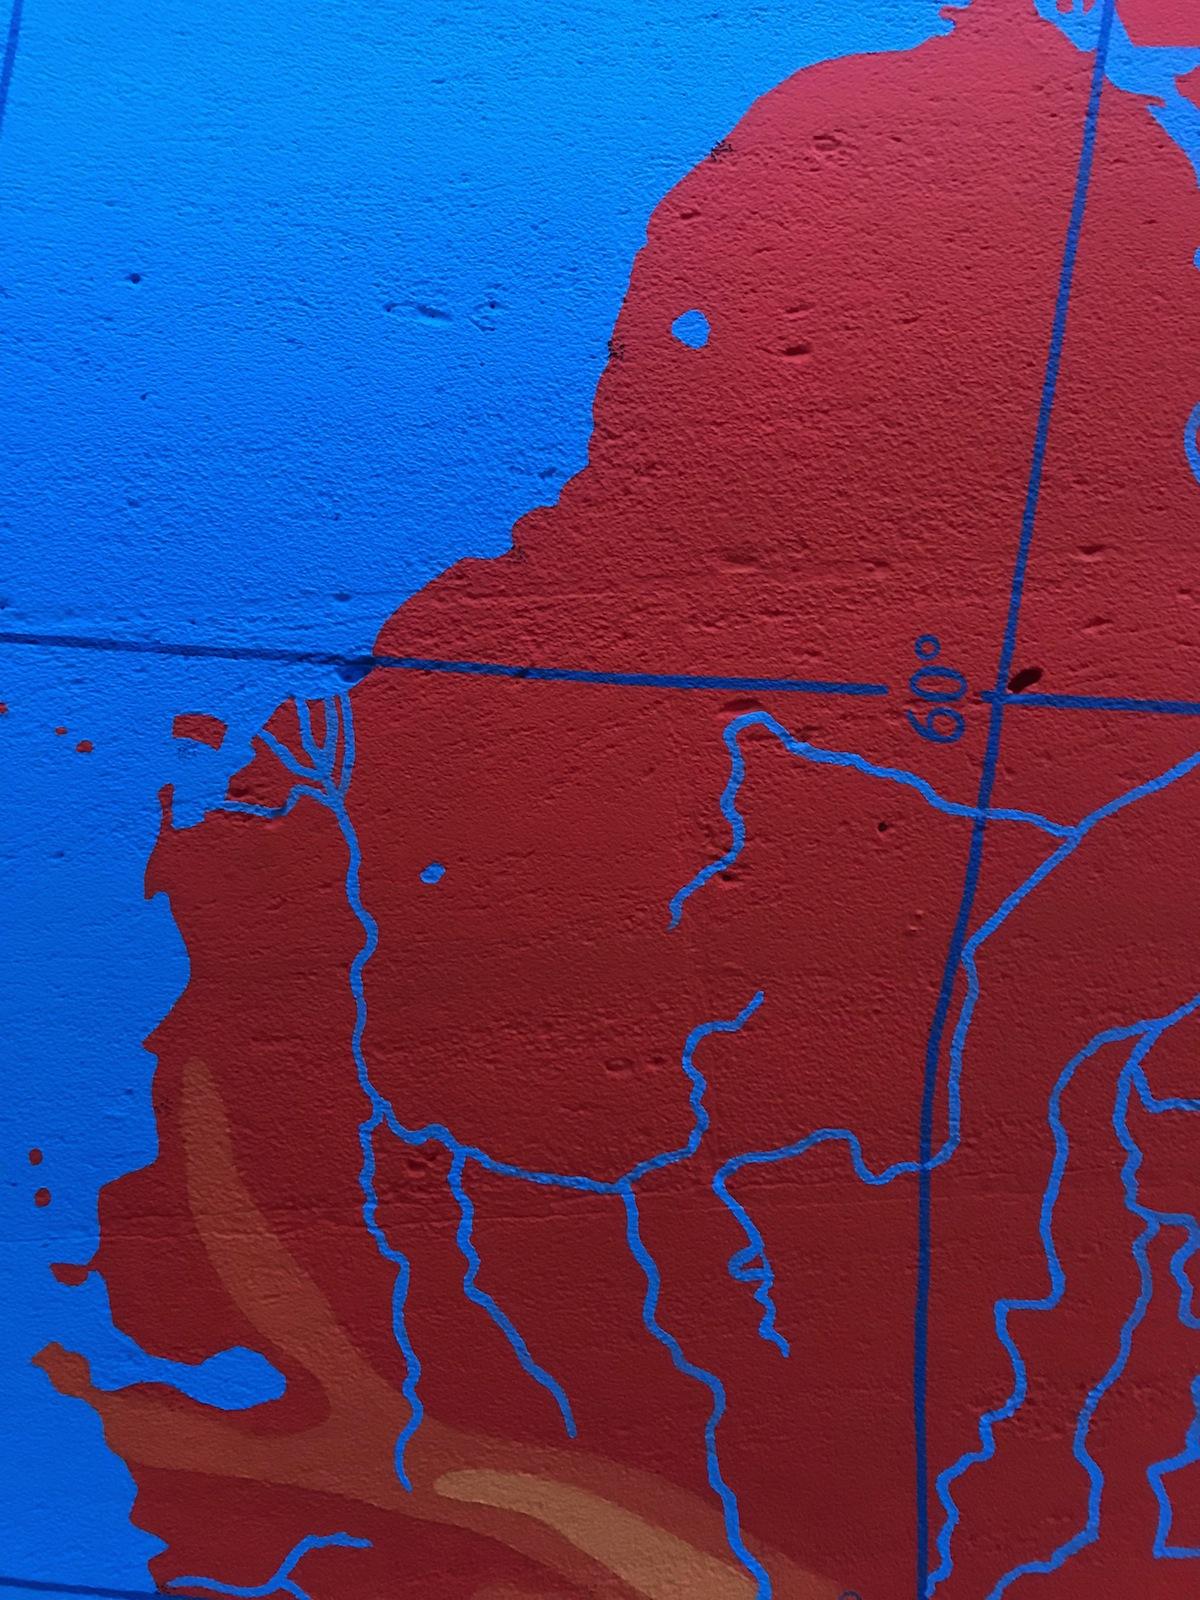 Buckminster_fuller_mural_dymaxion_map-05